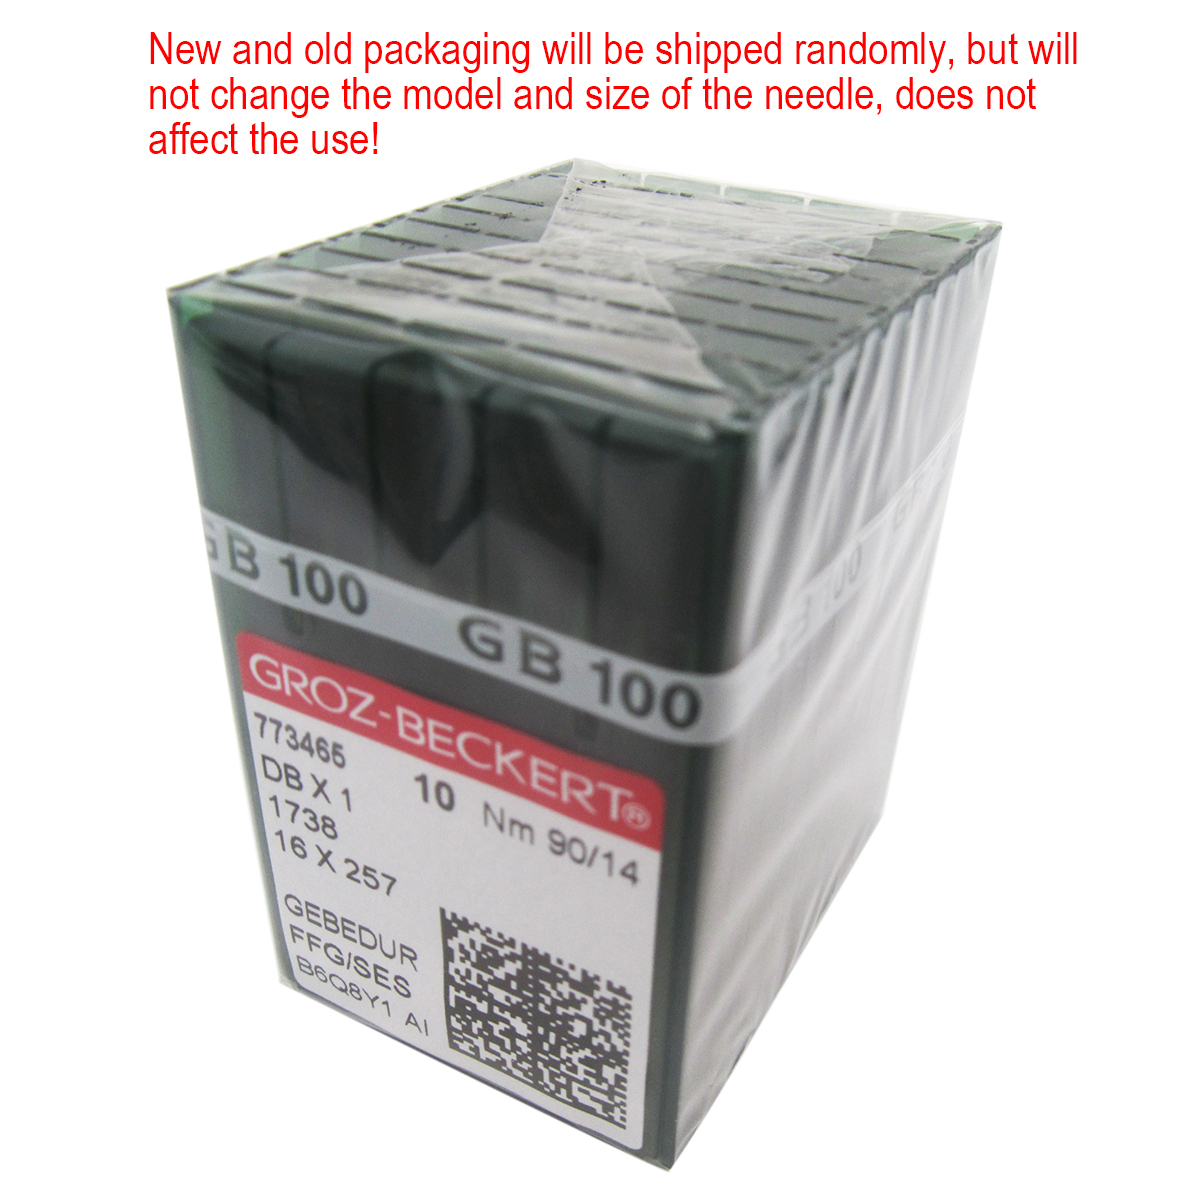 GROZ BECKERT INDUSTRIAL SEWING MACHINE NEEDLES DBx1 16x257  1738